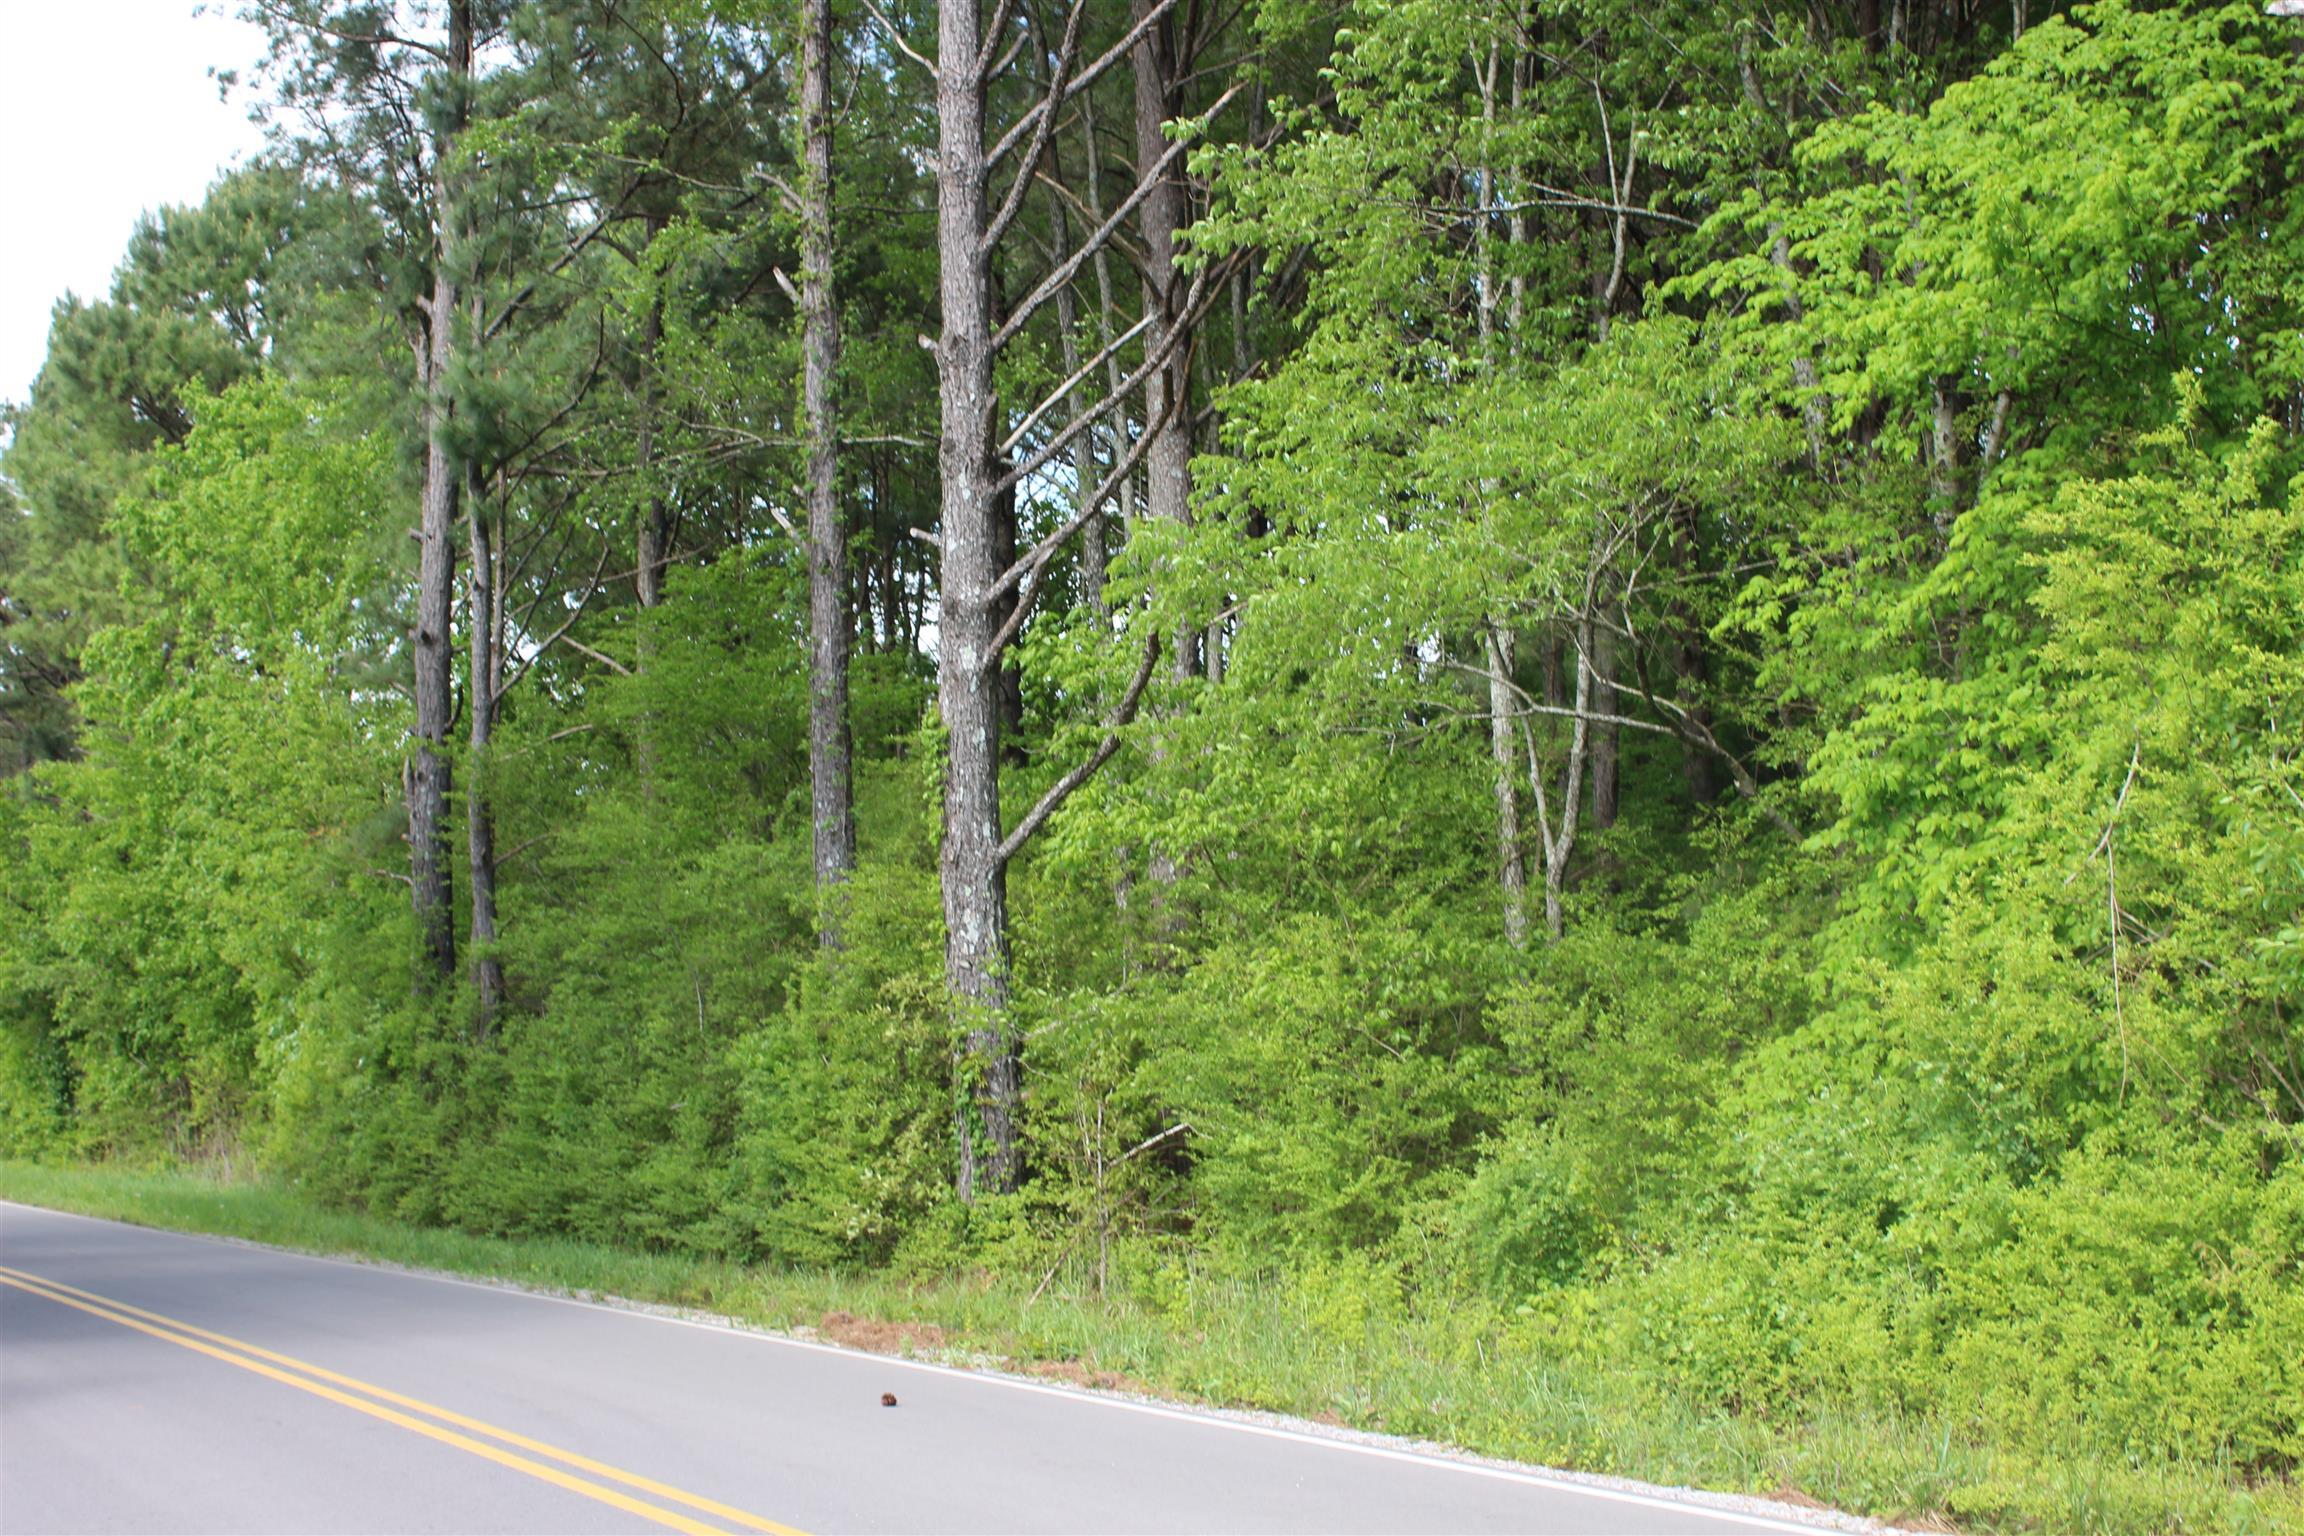 0 Harvester Ave, Lawrenceburg, TN 38464 - Lawrenceburg, TN real estate listing